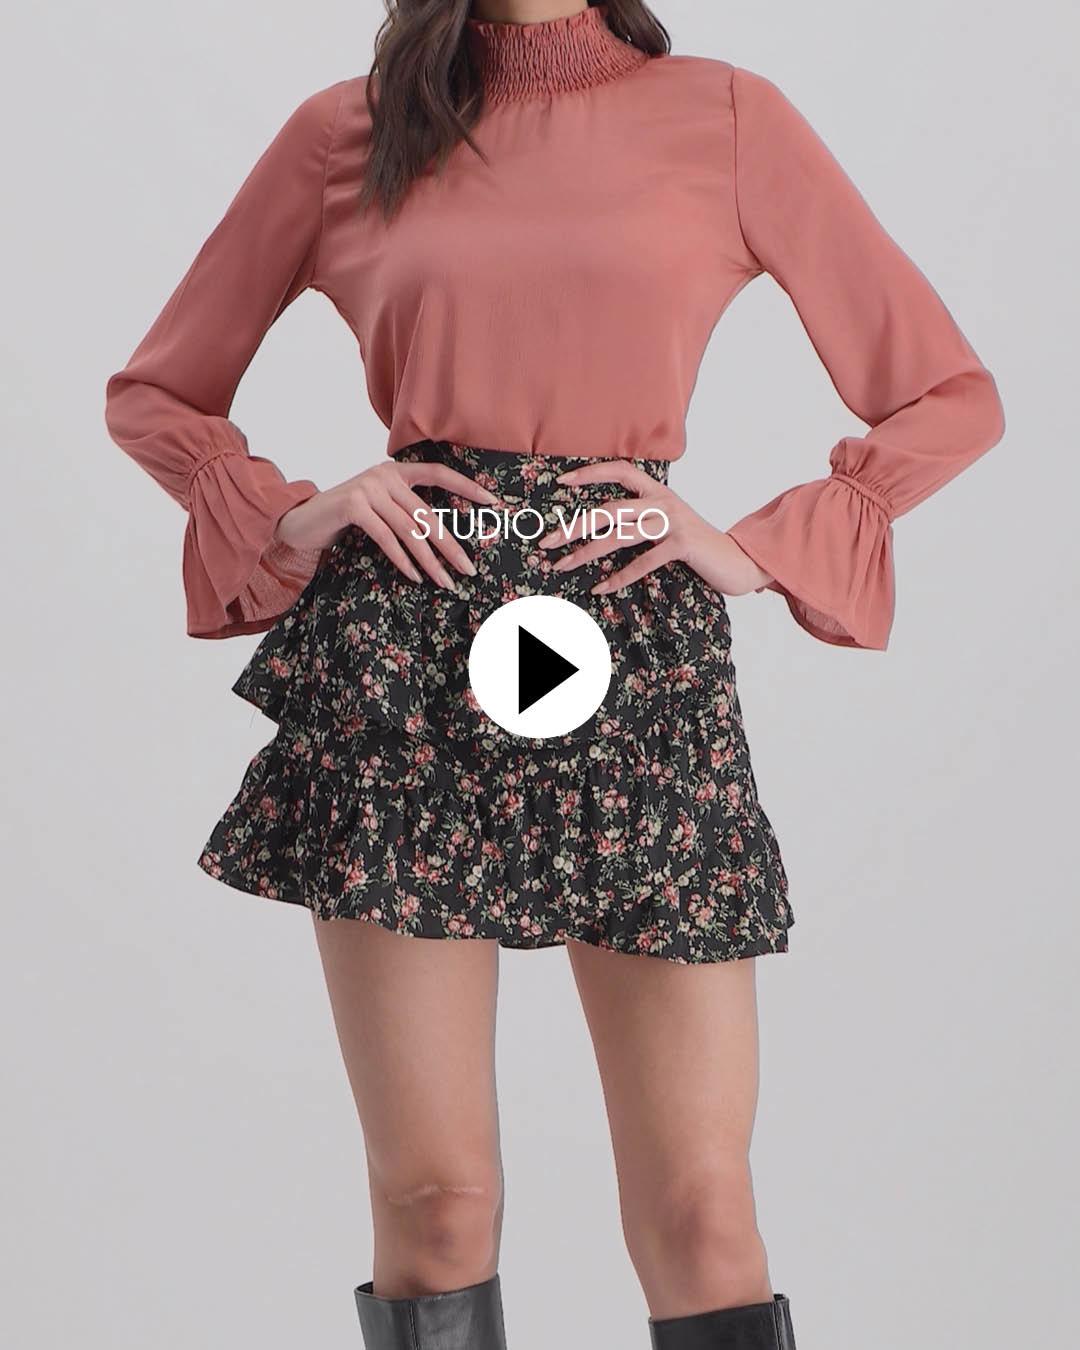 Lofty Manner Pink Top Jalou